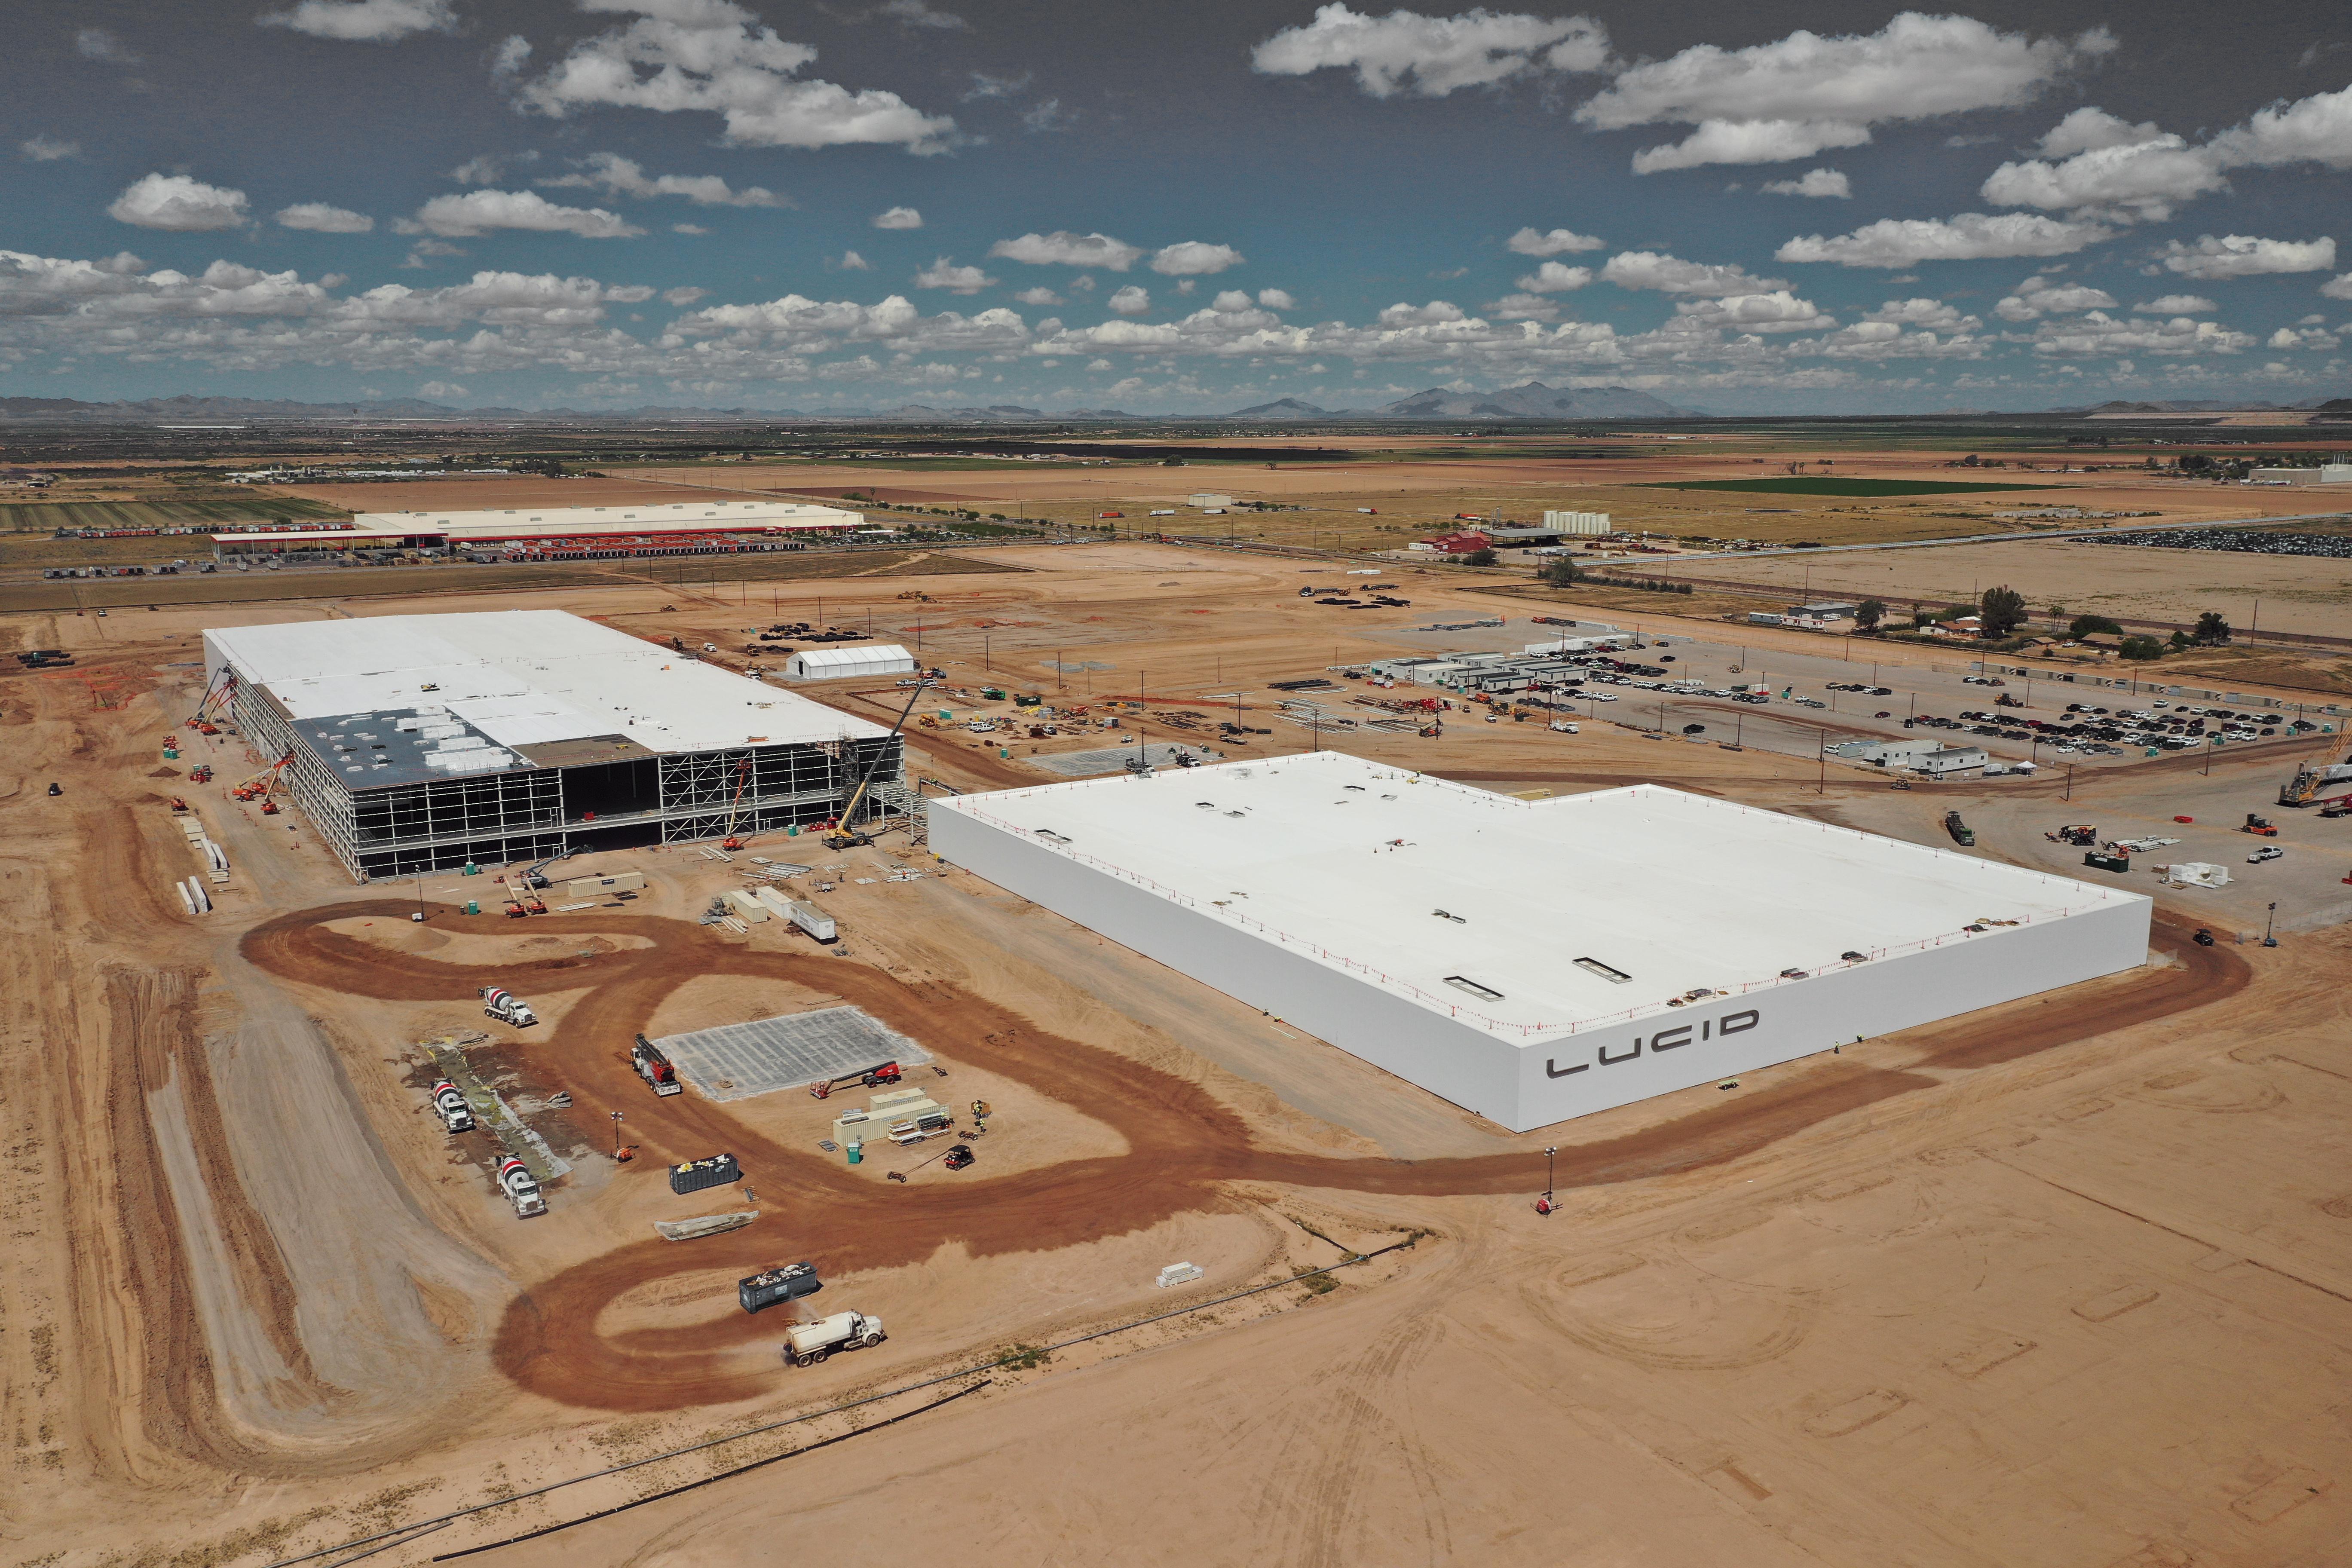 Lucid Motors factory AZ